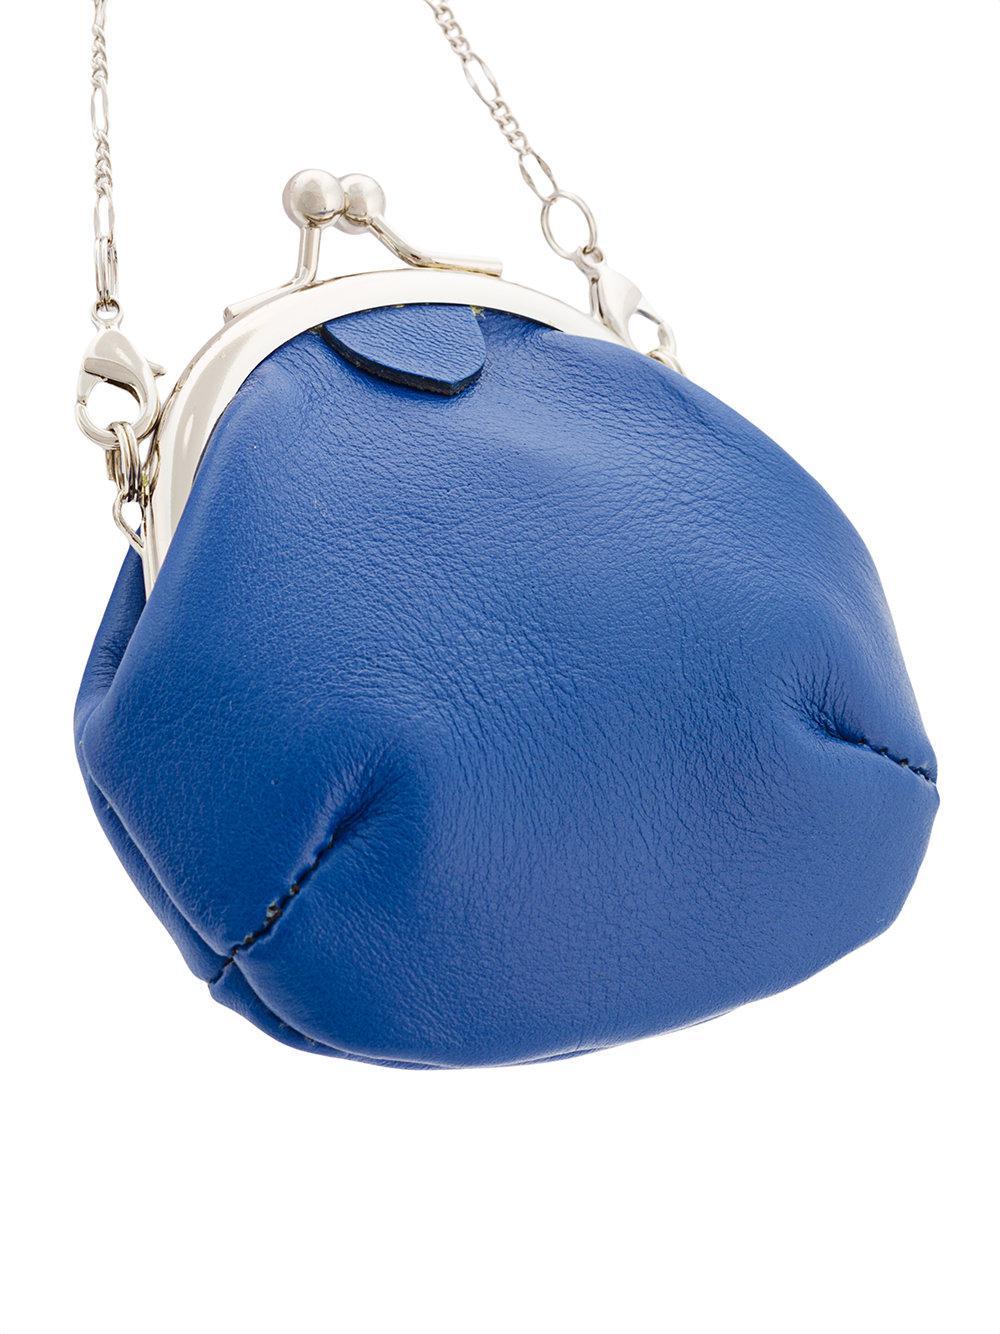 wallet necklace - Blue Yohji Yamamoto NwW2MviYM2